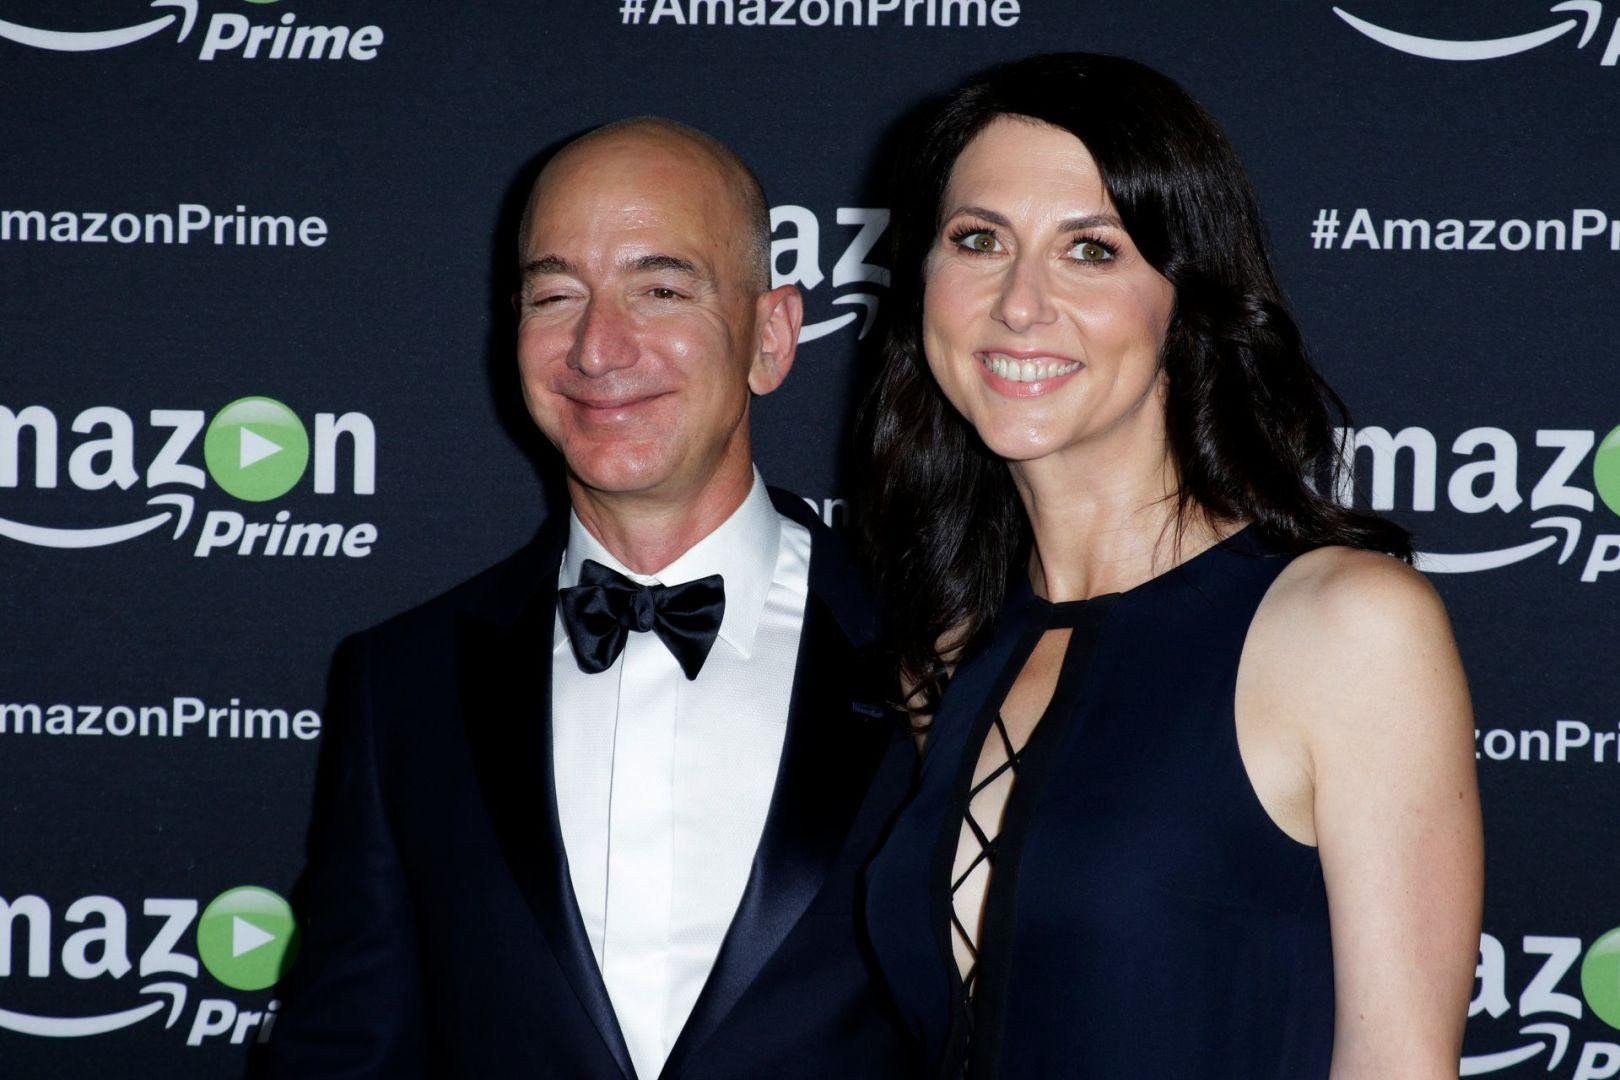 Billionaire MacKenzie Scott Marries Seattle Teacher, Ex-Husband Jeff Bezos Calls Him 'Great Guy' - Yahoo Entertainment